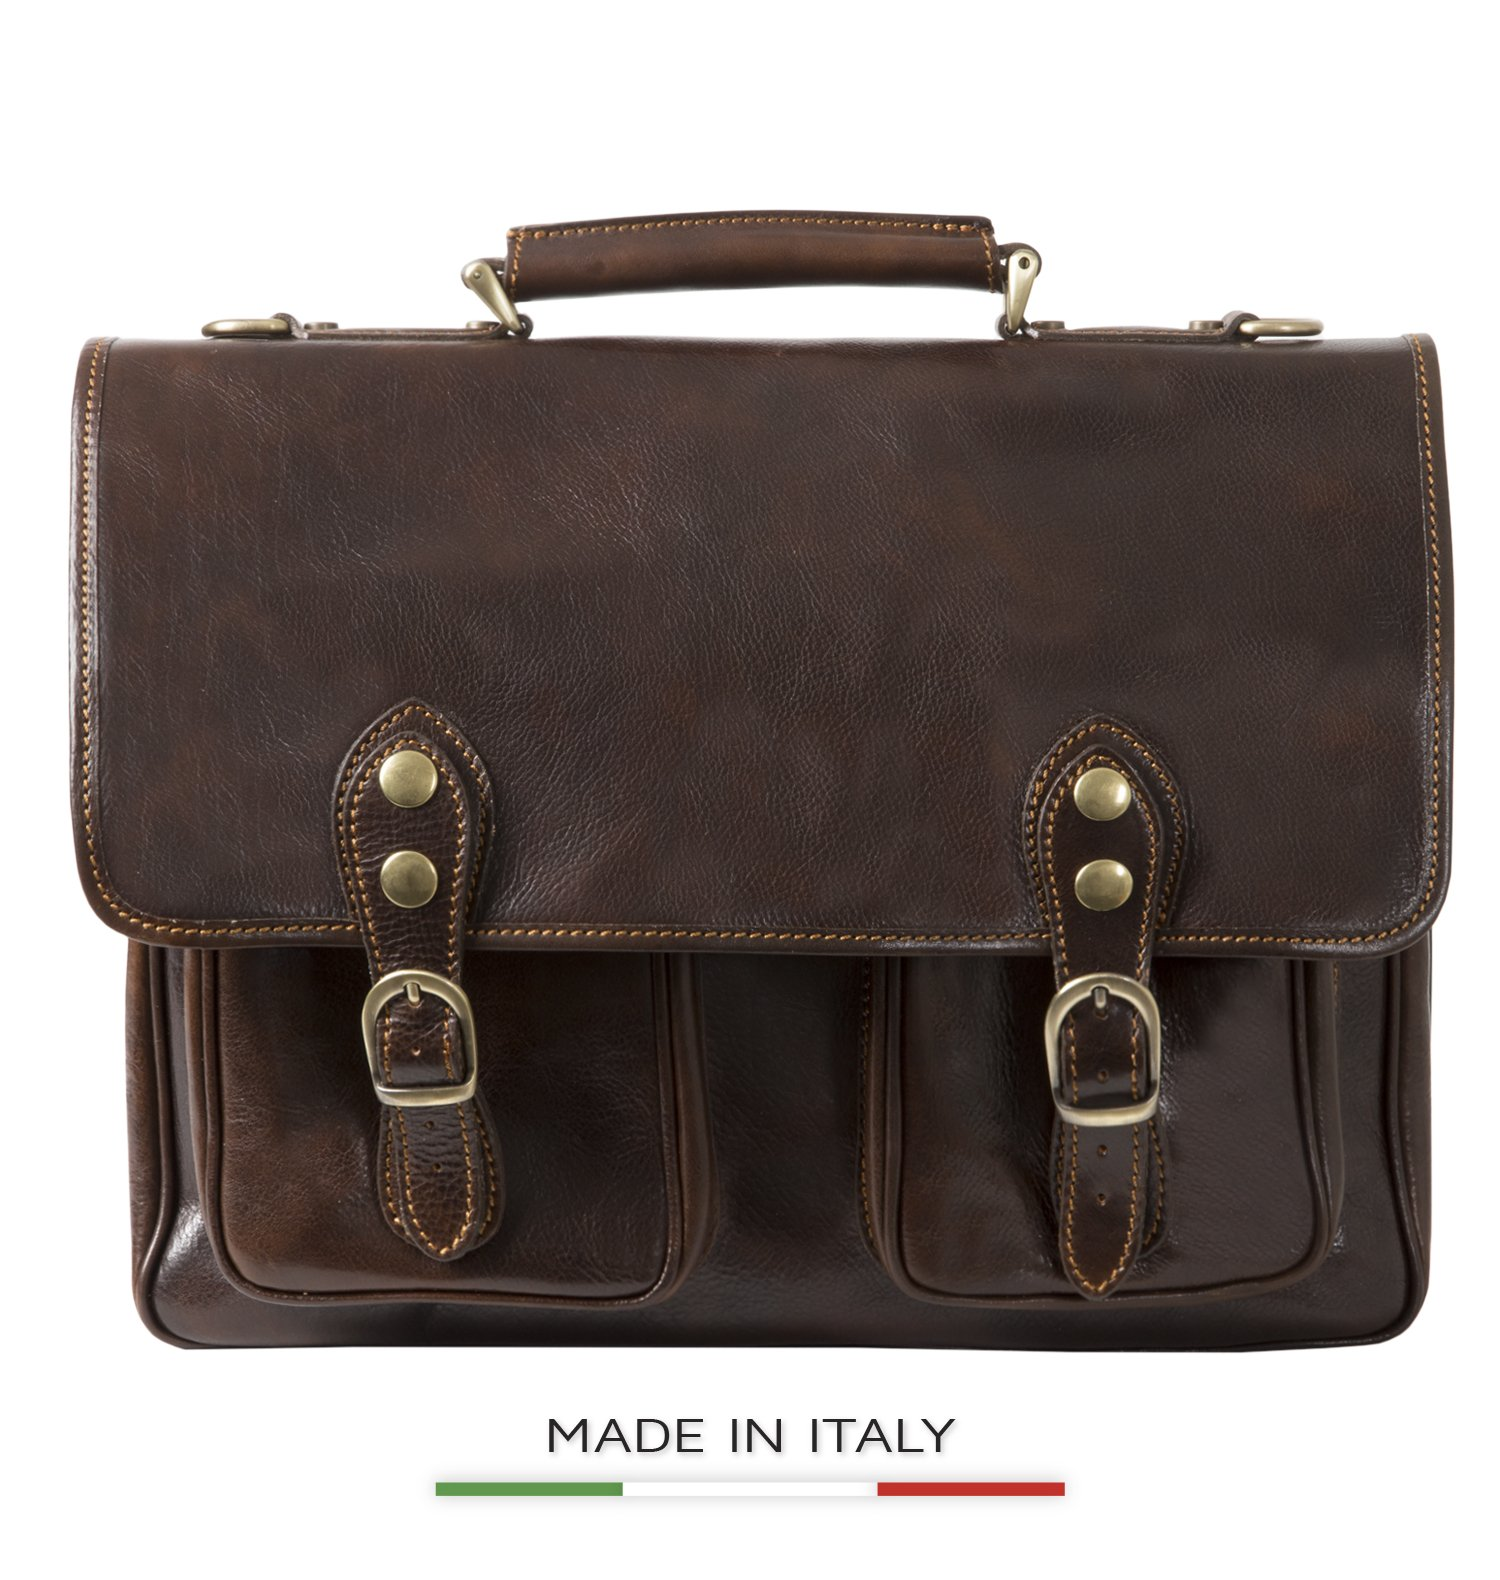 Luggage Depot USA, LLC Men's Alberto Bellucci Italian Leather Express Satchel D. Brn Laptop Messenger Bag, Dark Brown, One Size by Luggage Depot USA, LLC (Image #1)